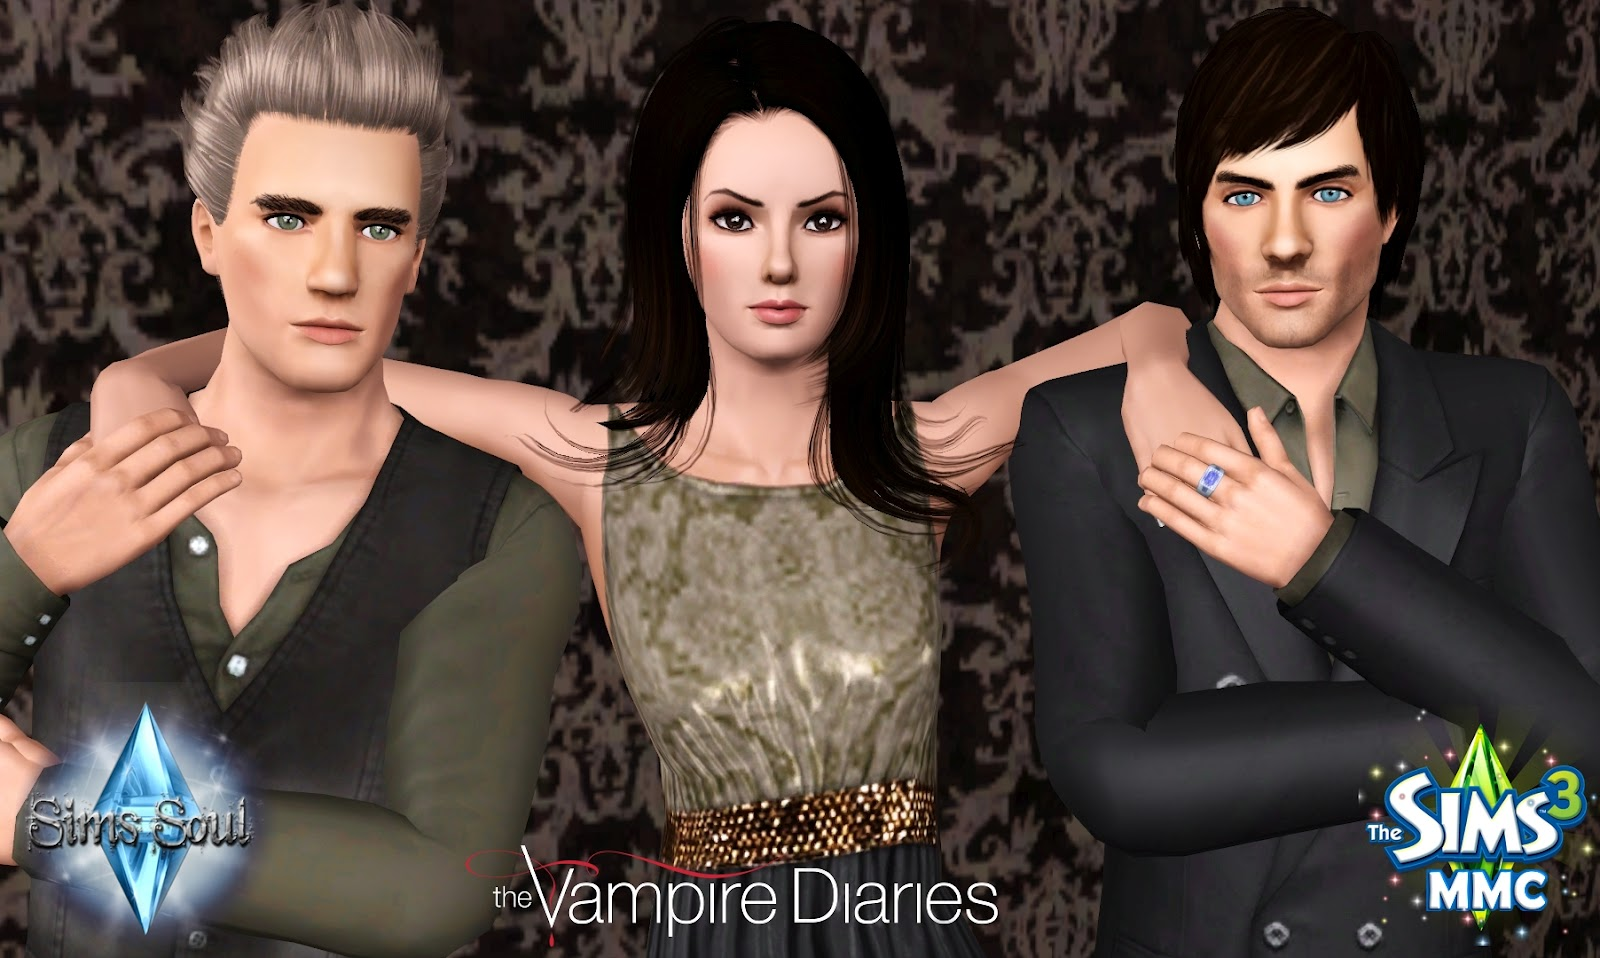 meet vampire diaries cast 2012 uk